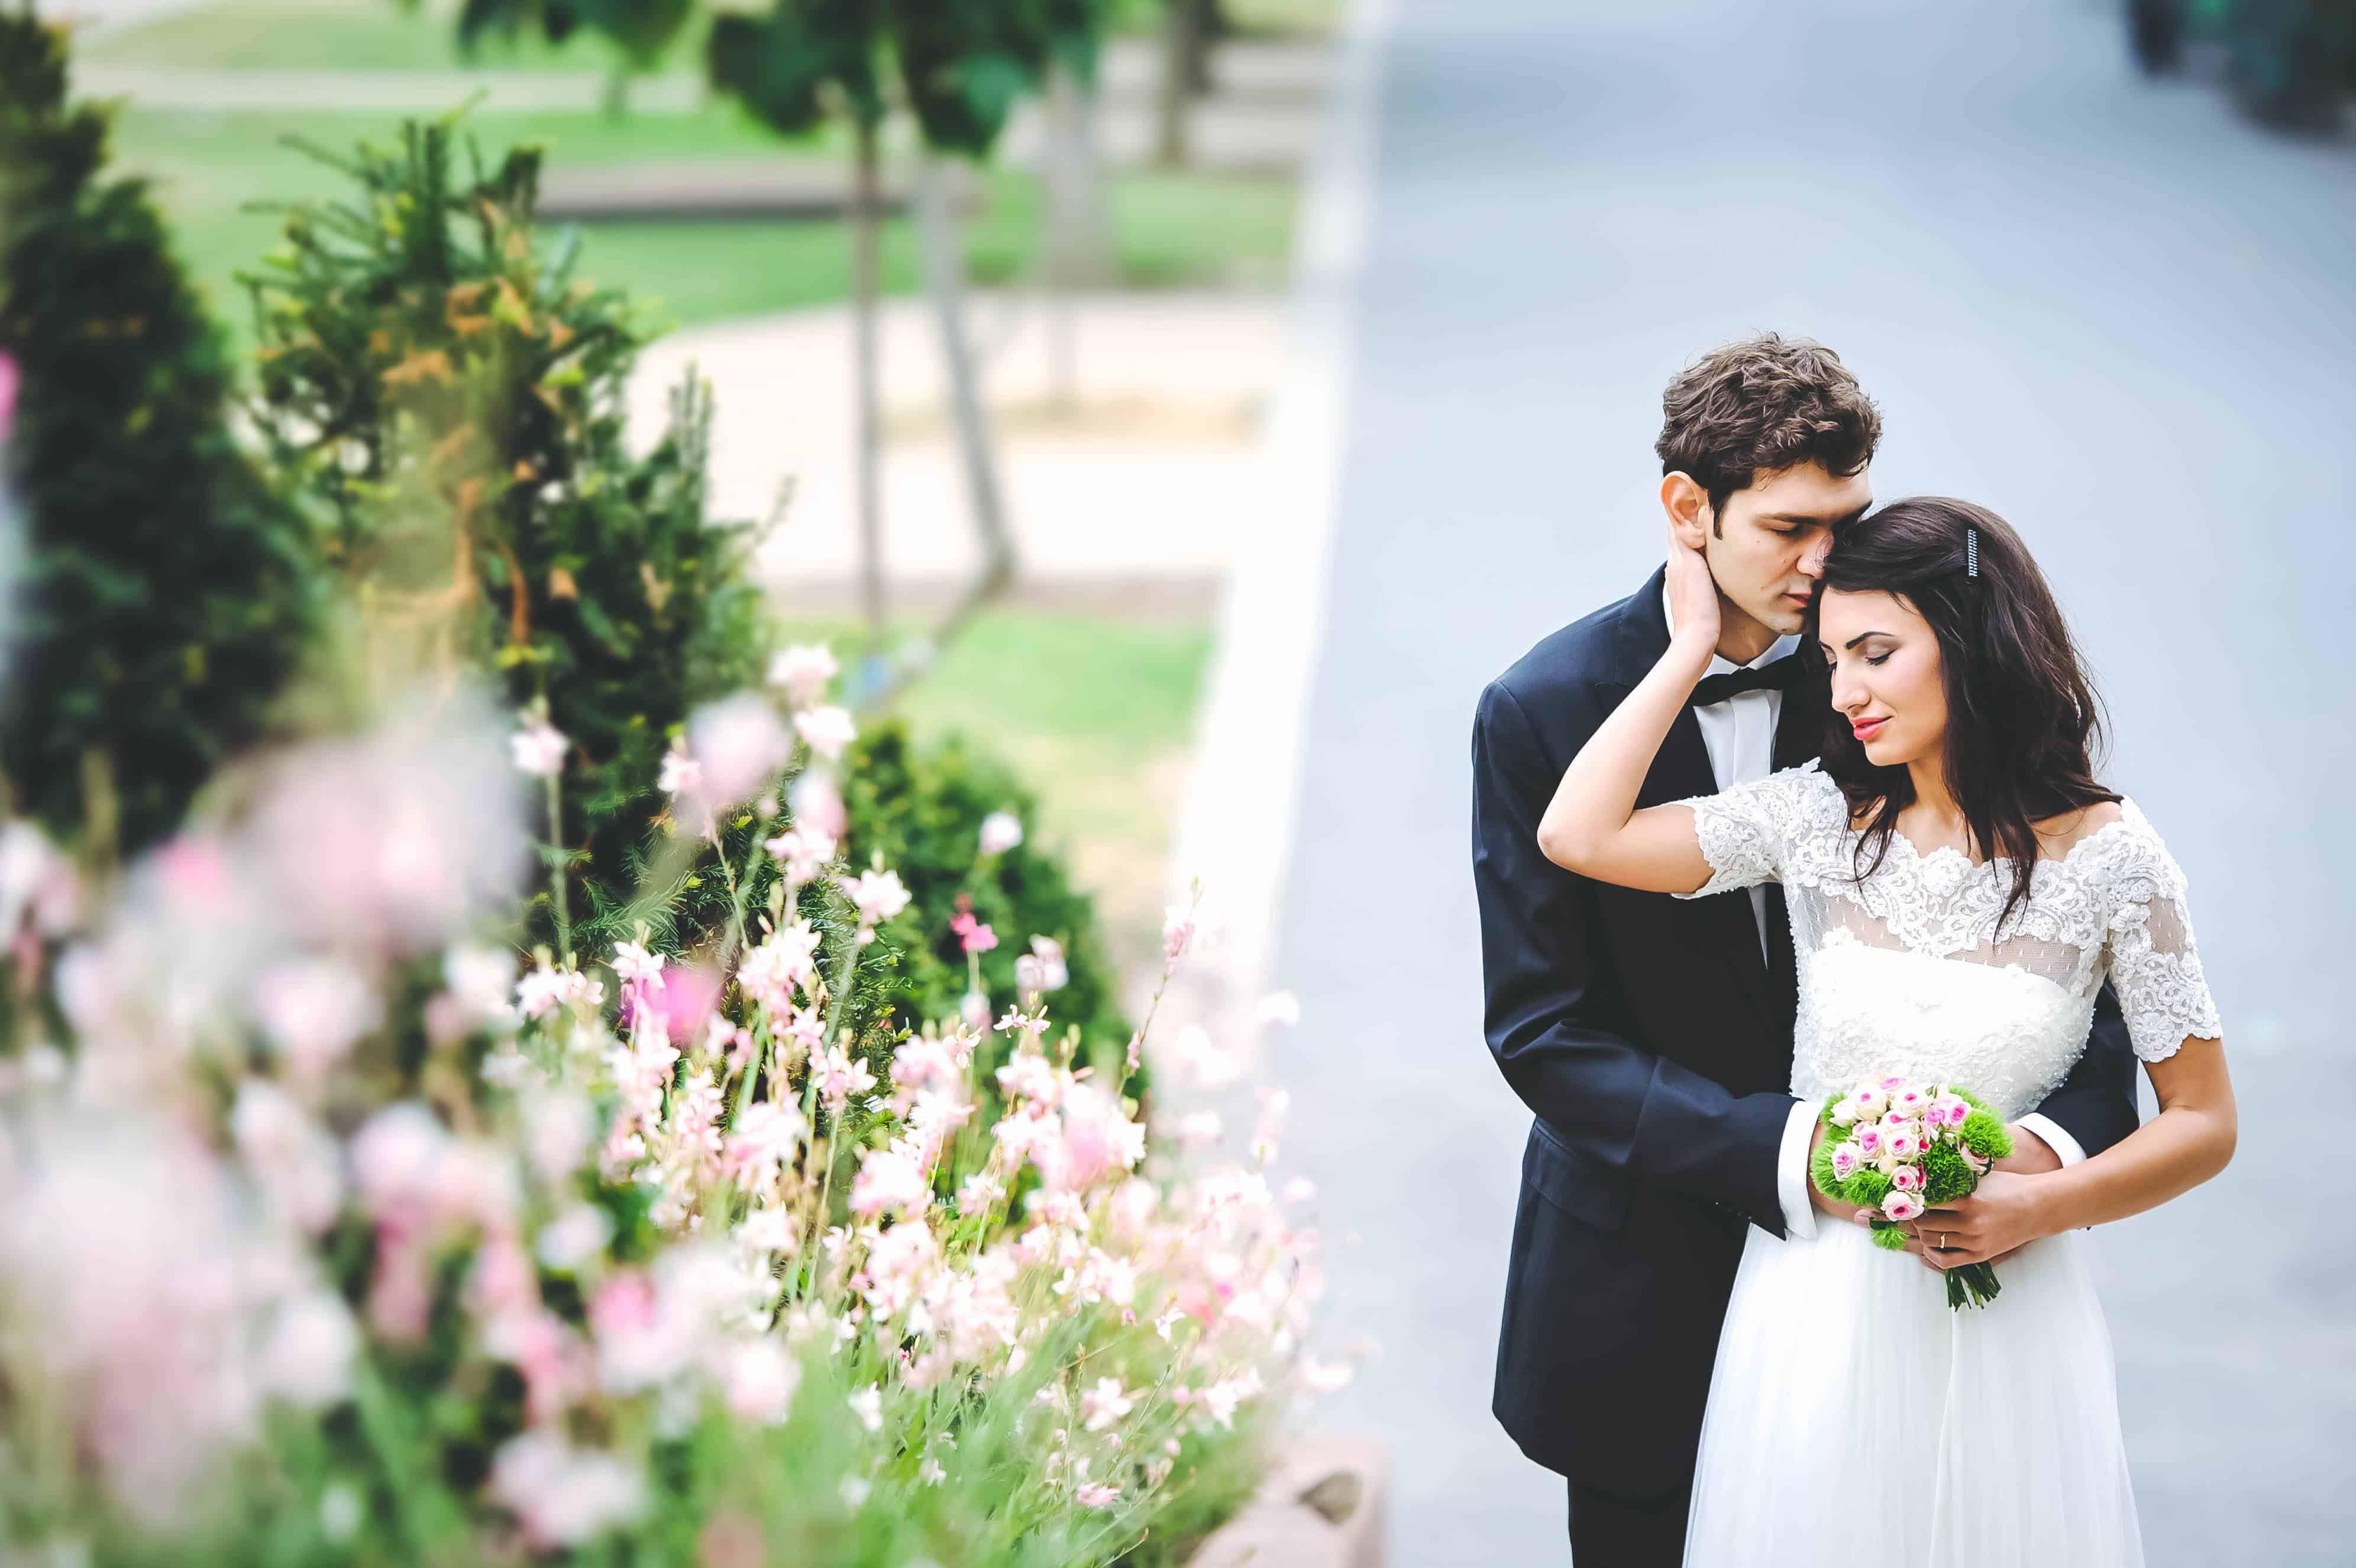 Ele-gant-Wedding-Free-Preset-1-of-2